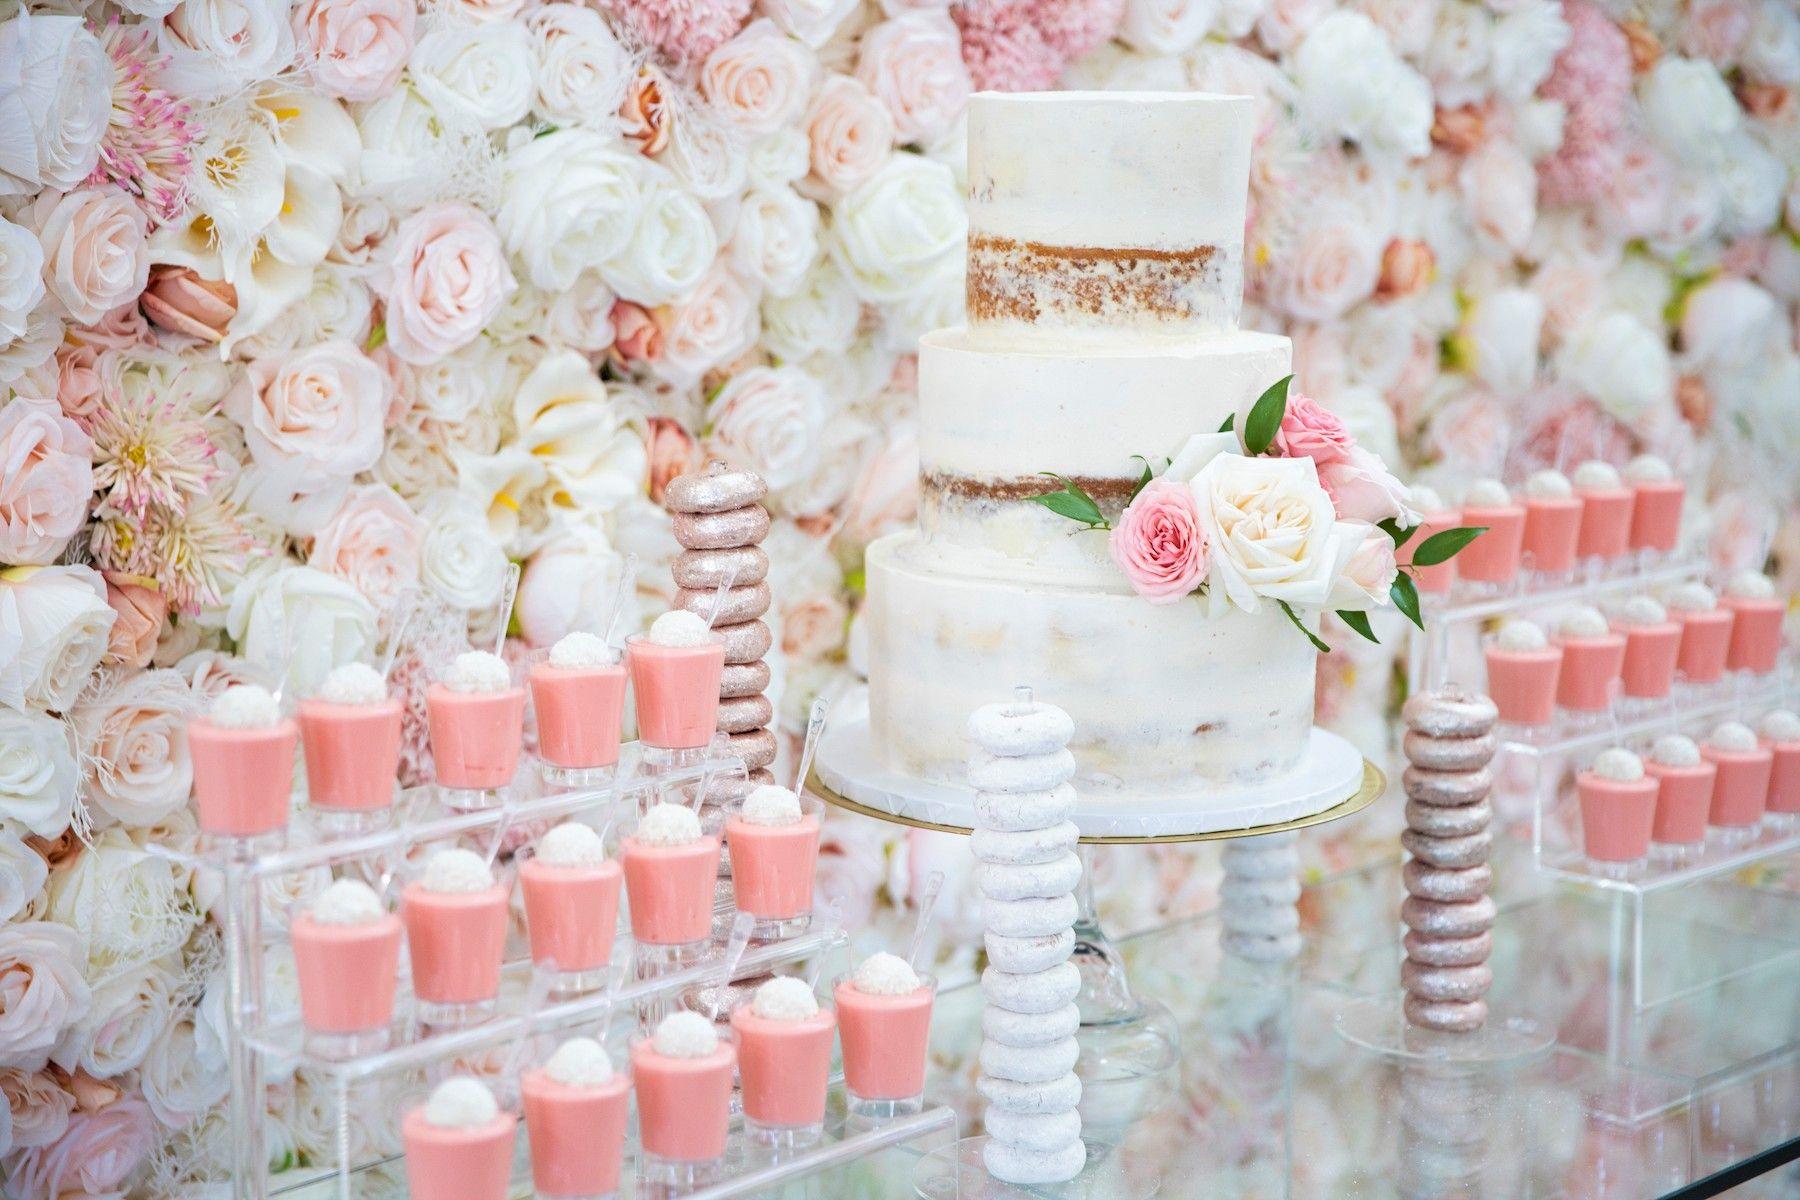 Alchemy bake lab wedding cakes weddings in houston in